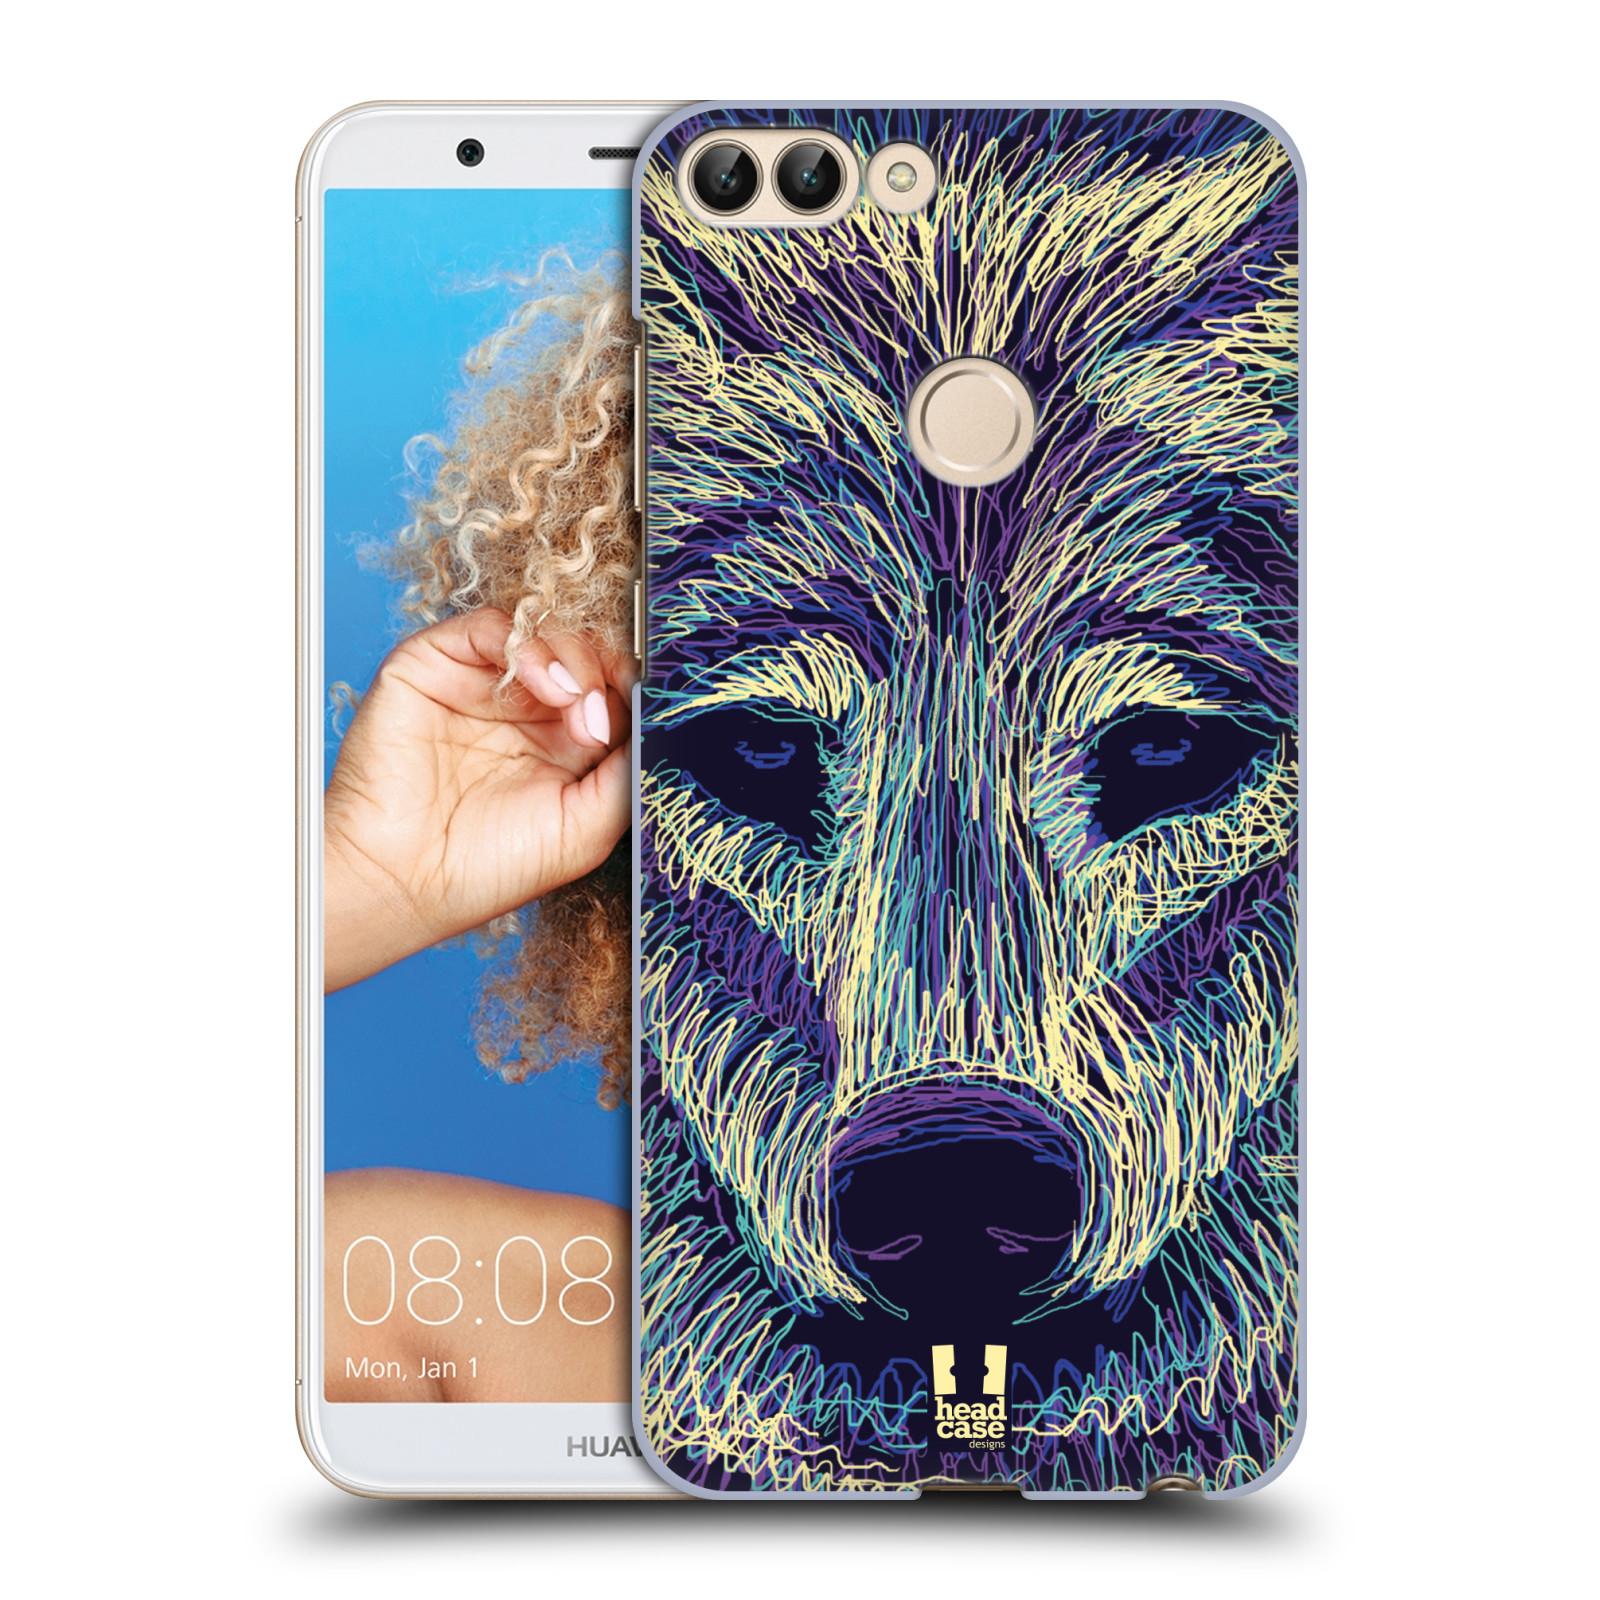 HEAD CASE plastový obal na mobil Huawei P Smart vzor zvíře čmáranice vlk